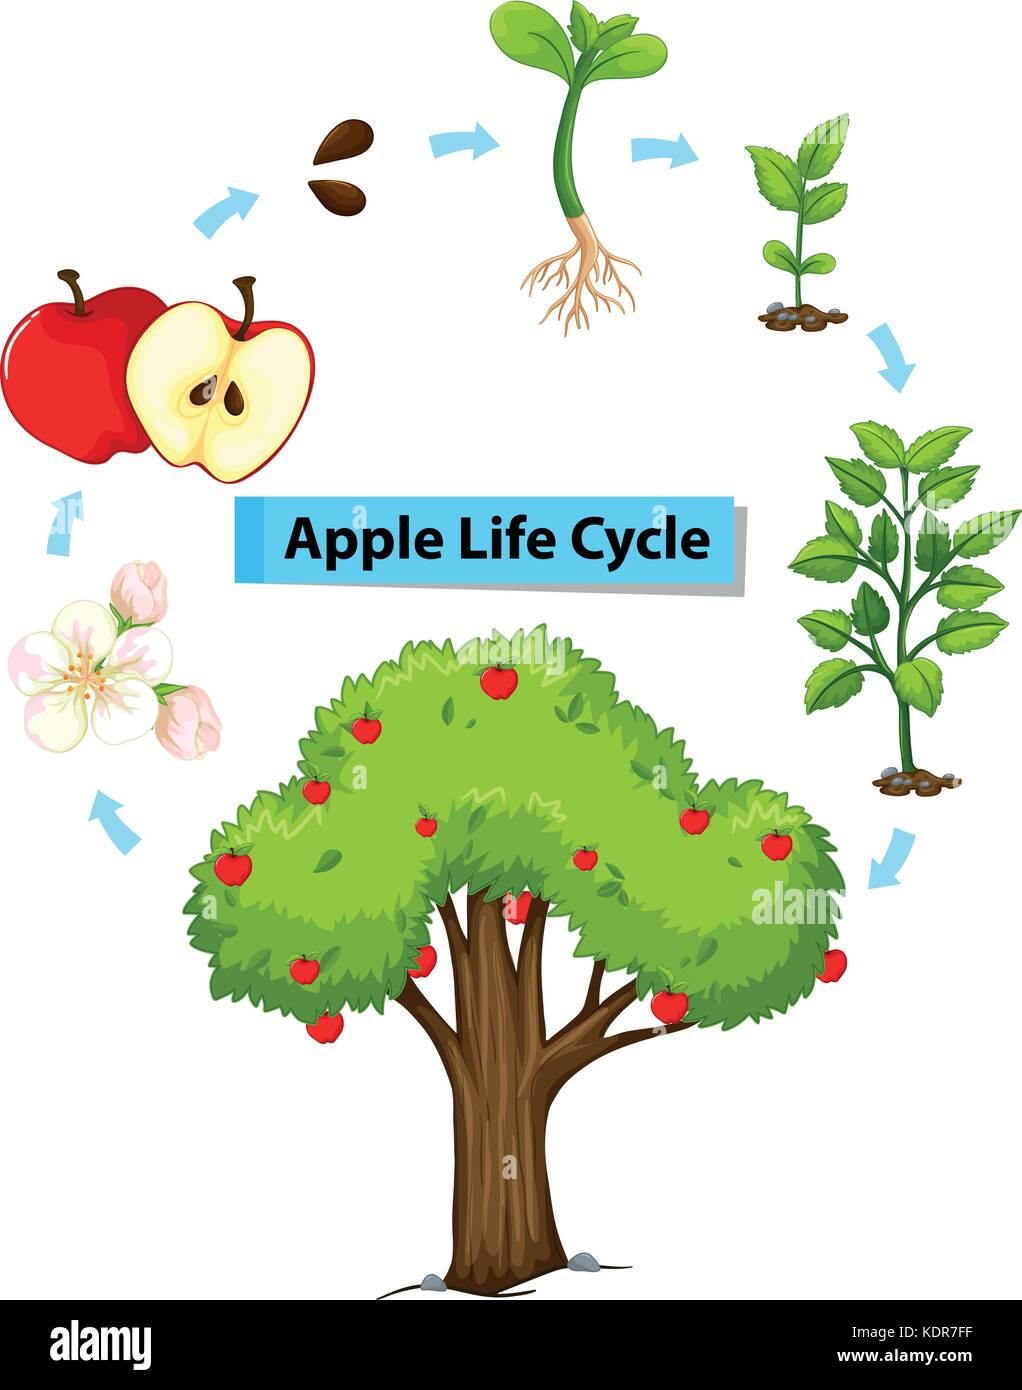 Flower Life Cycle Illustration Stock Photos  U0026 Flower Life